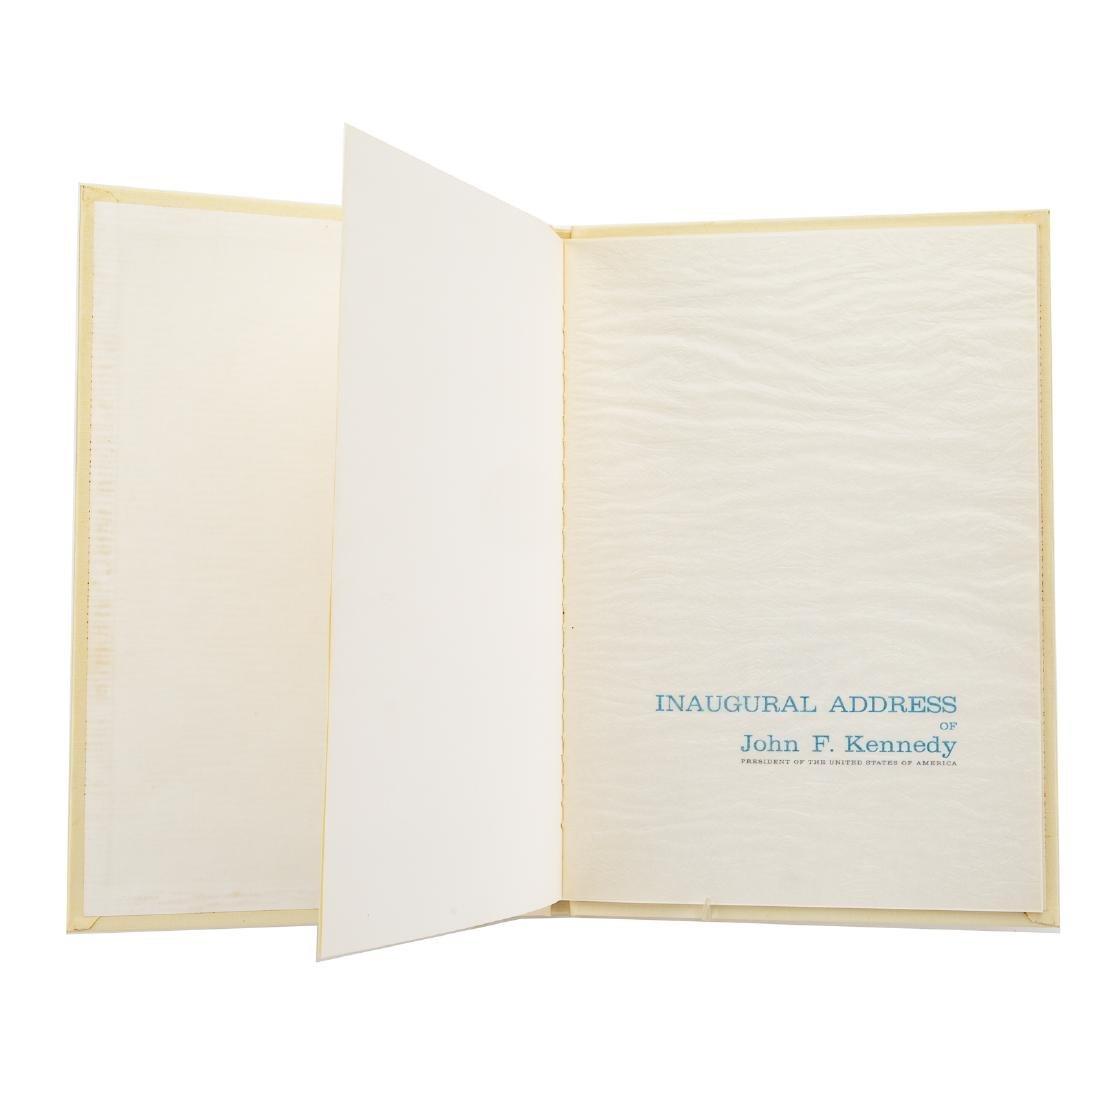 Inaugural Address of John F. Kennedy - 4